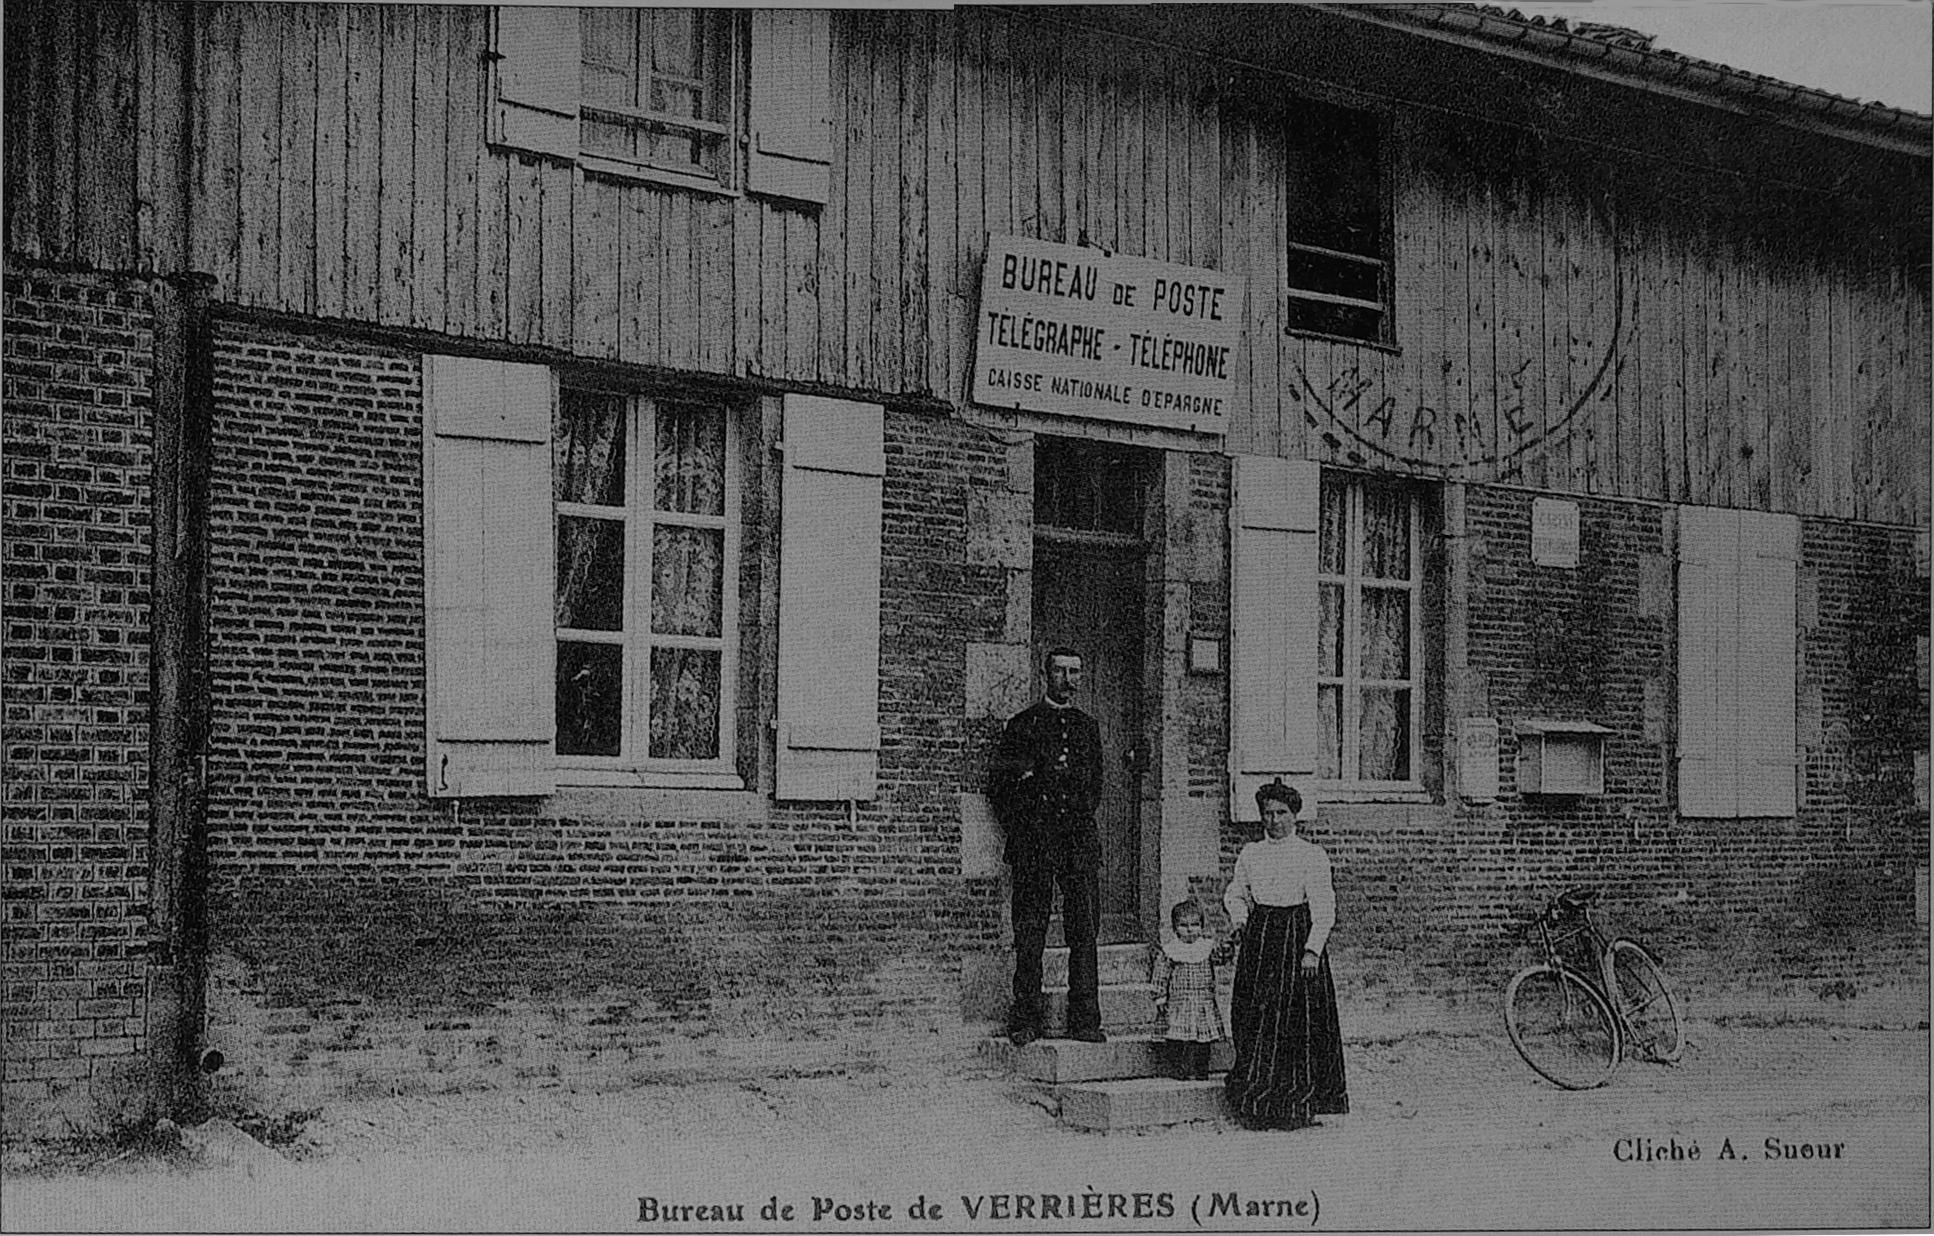 Verrières, Marne